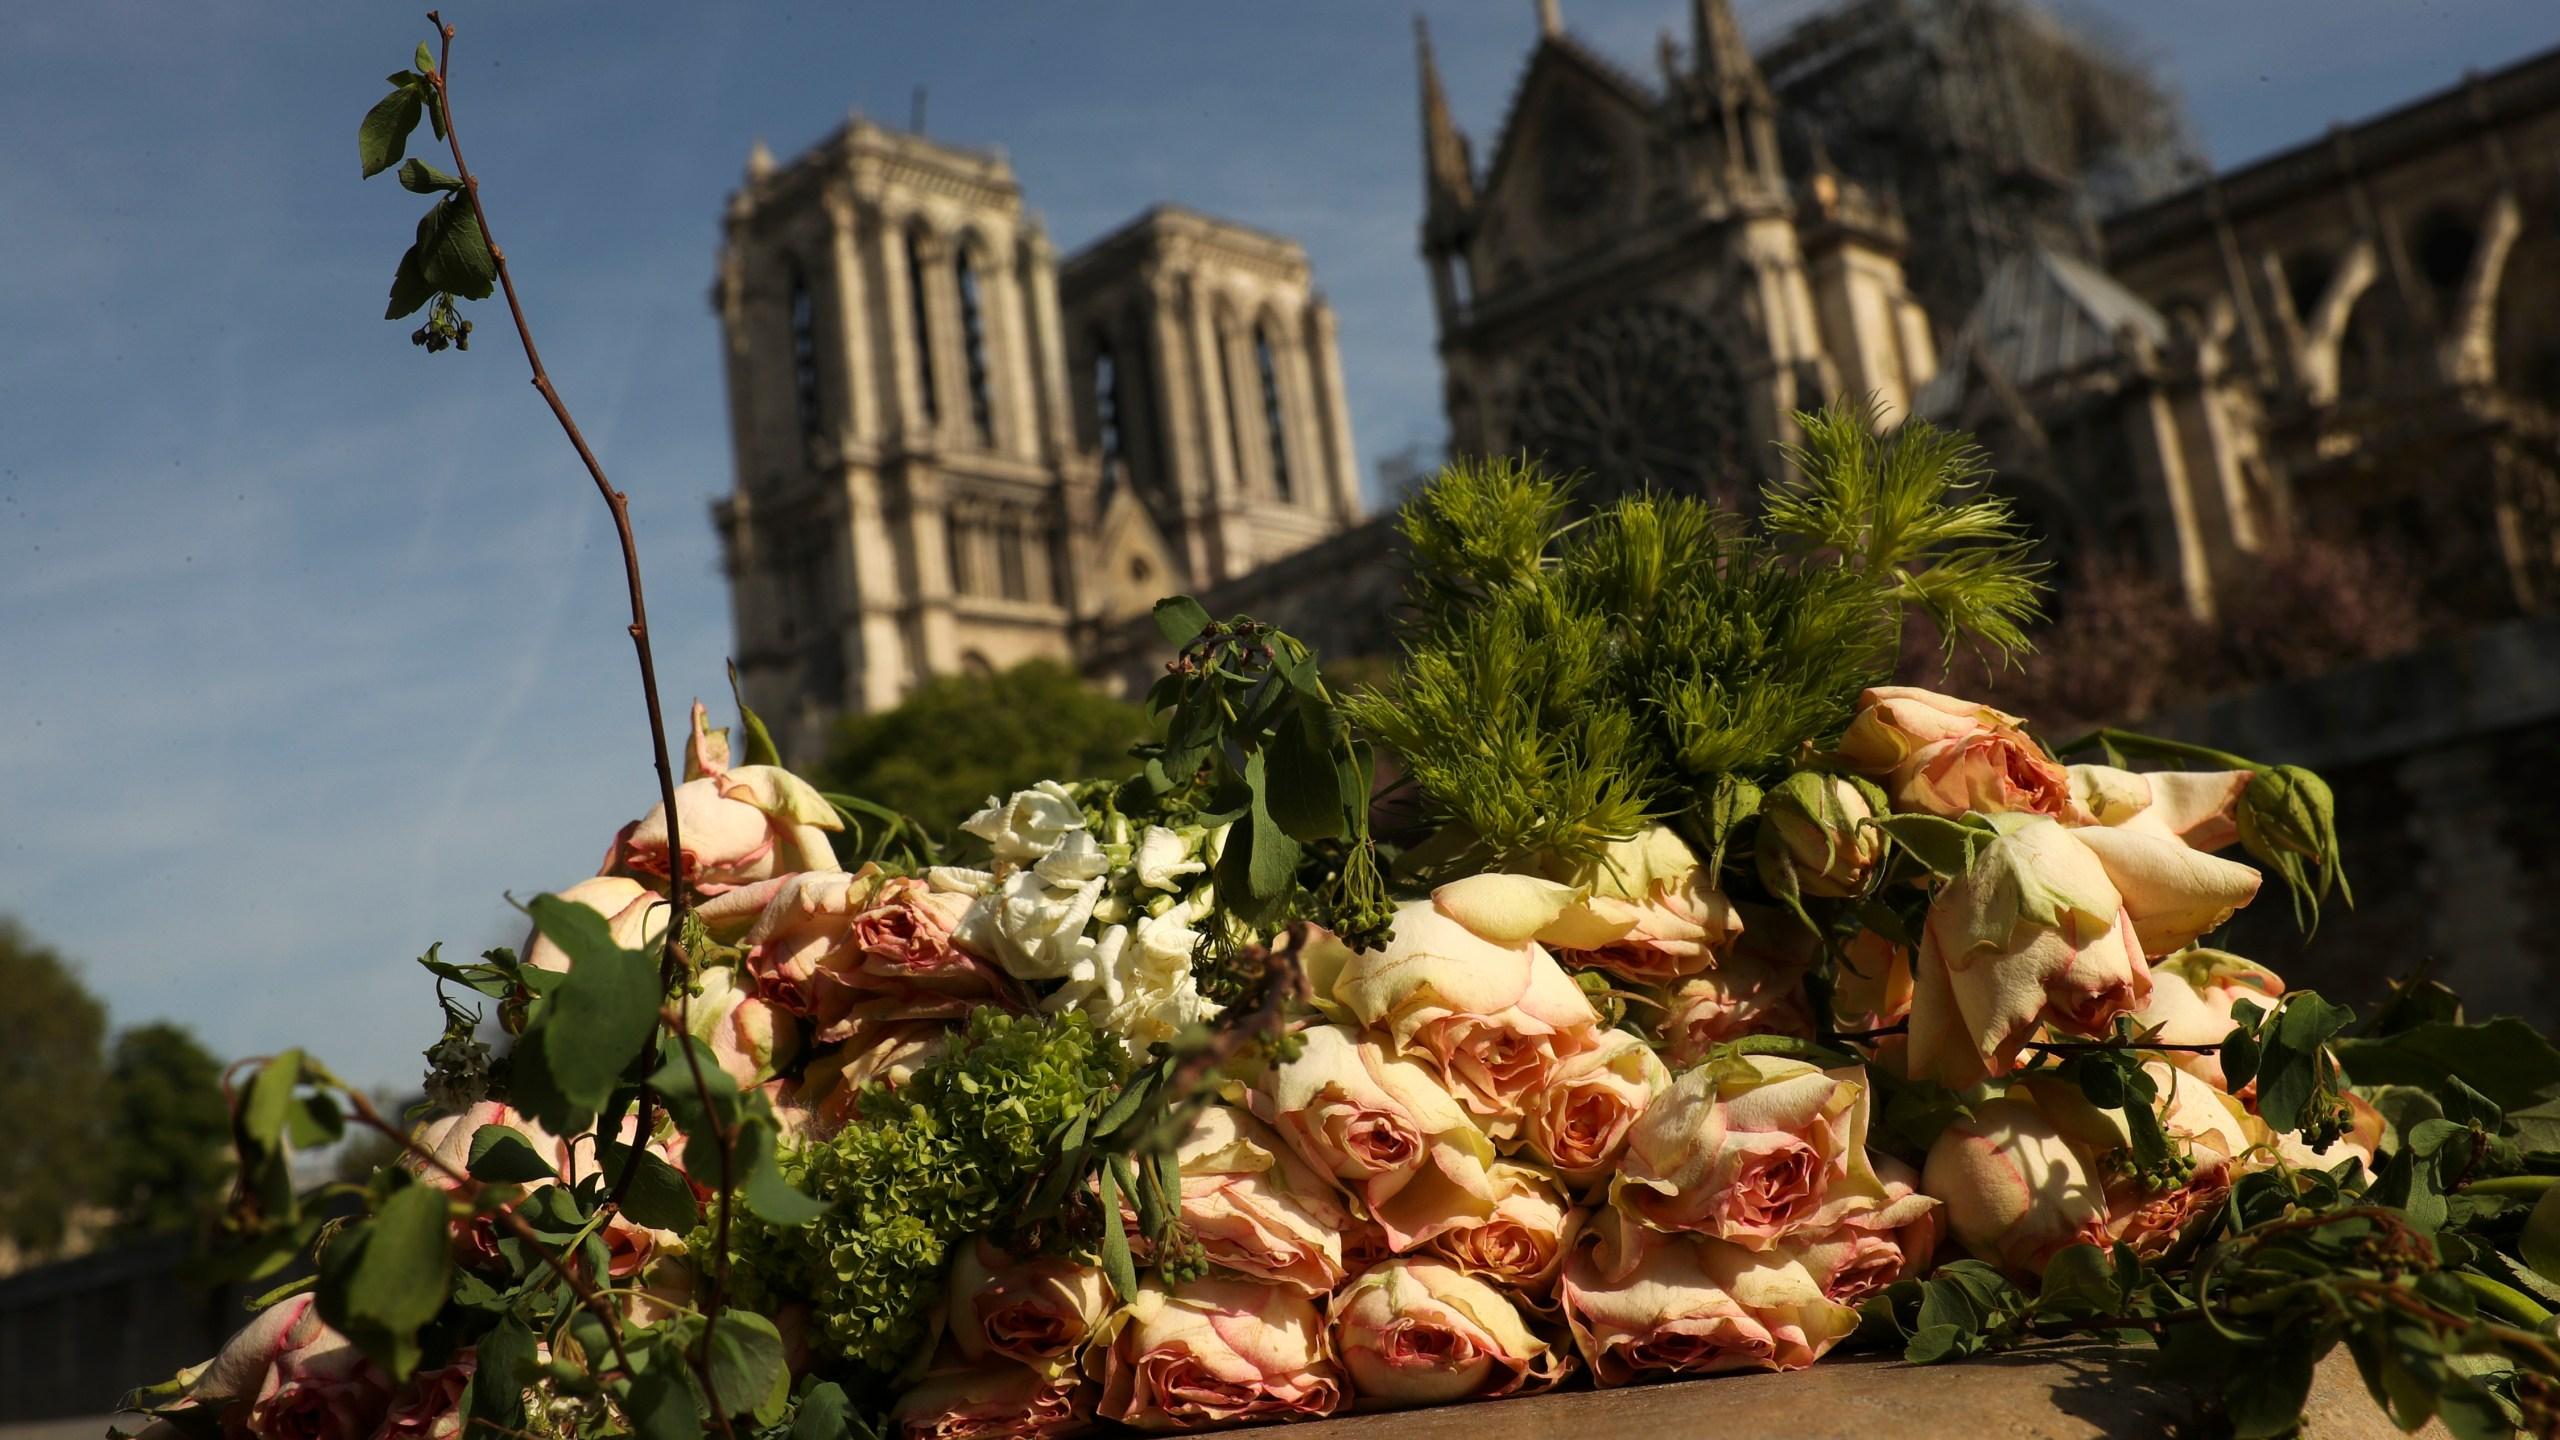 France_Notre_Dame_Fire_27504-159532.jpg83496104